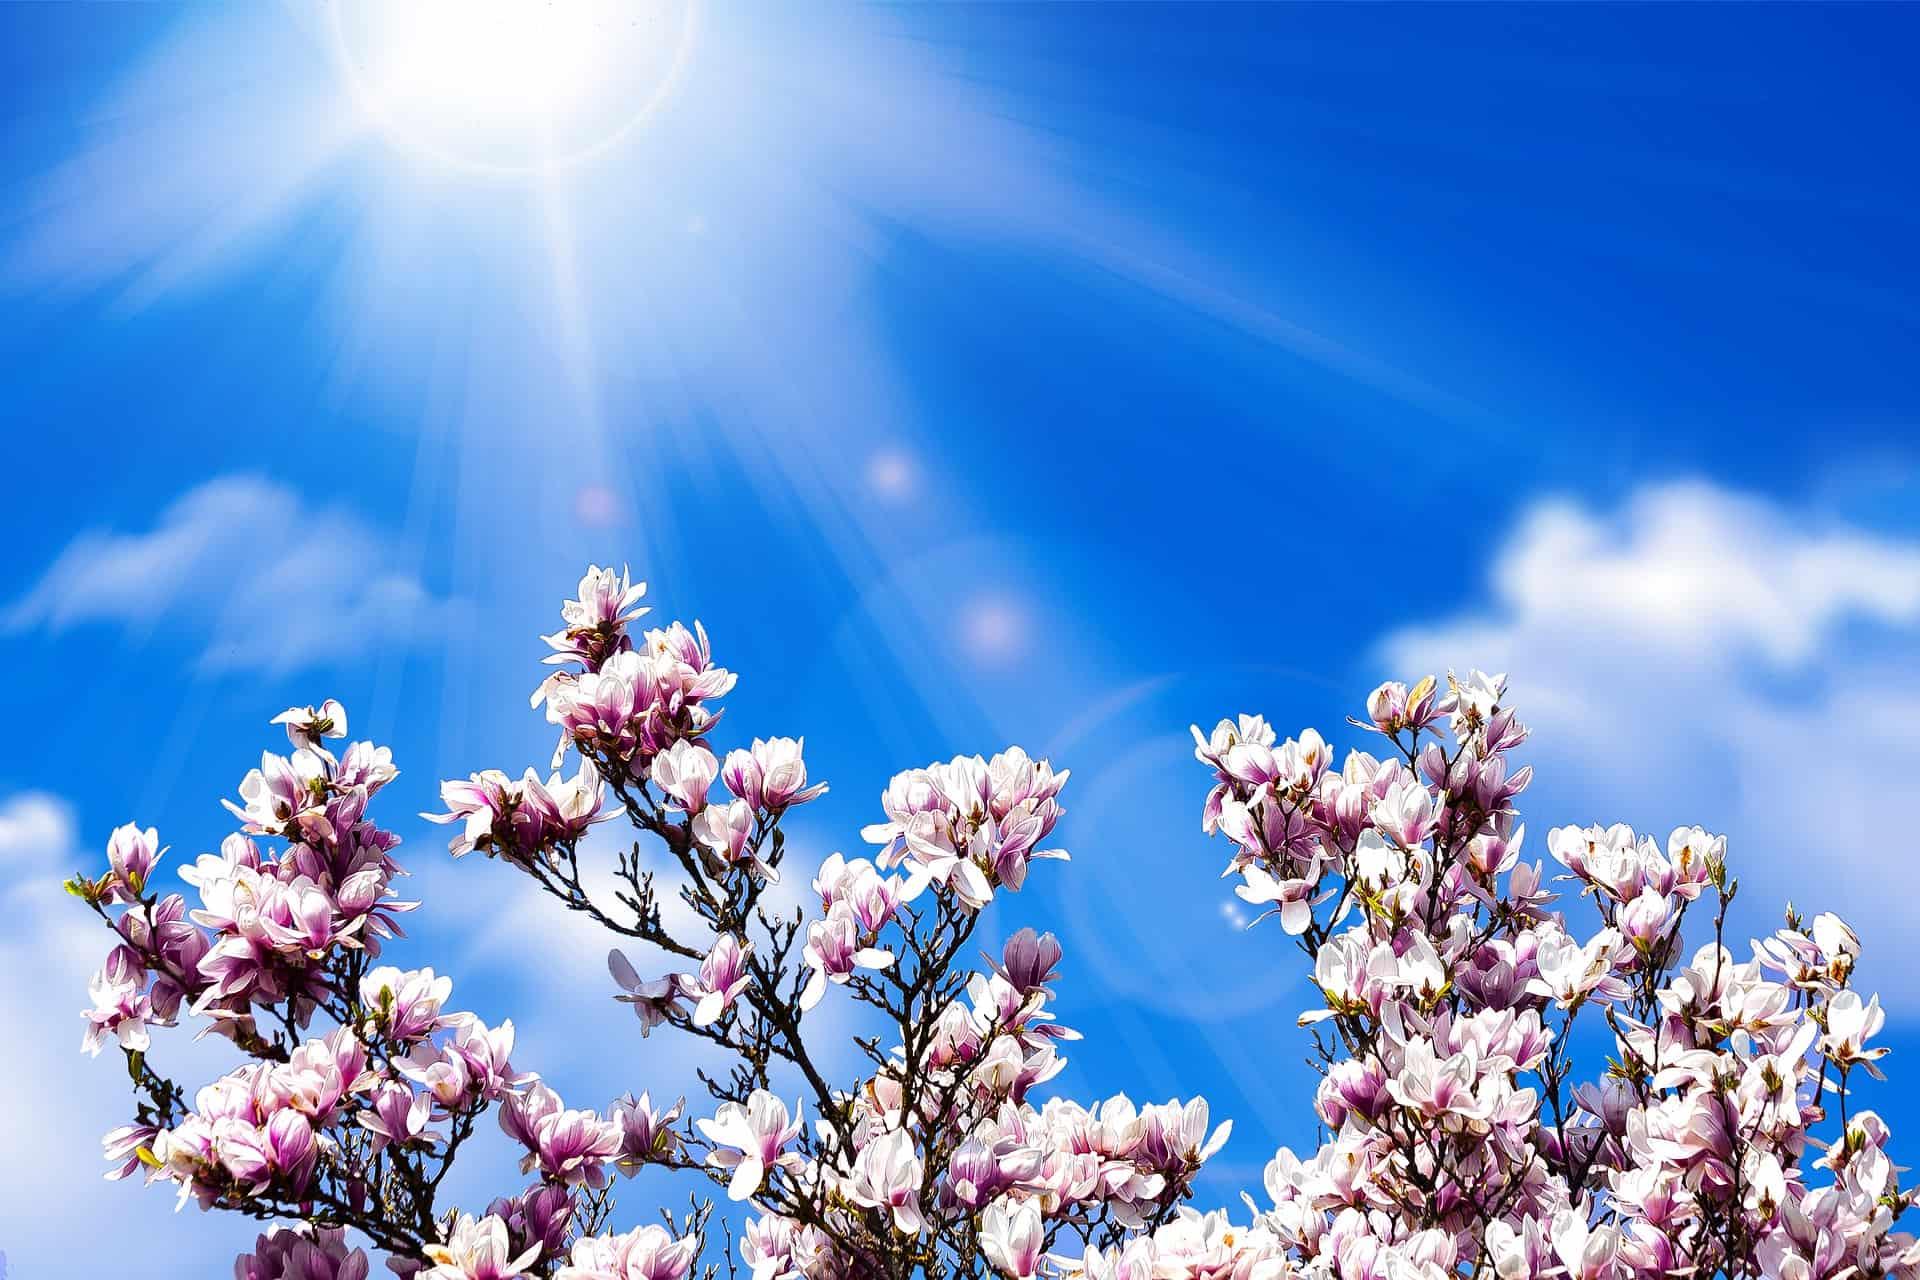 Best Fertilizer for Magnolia Trees